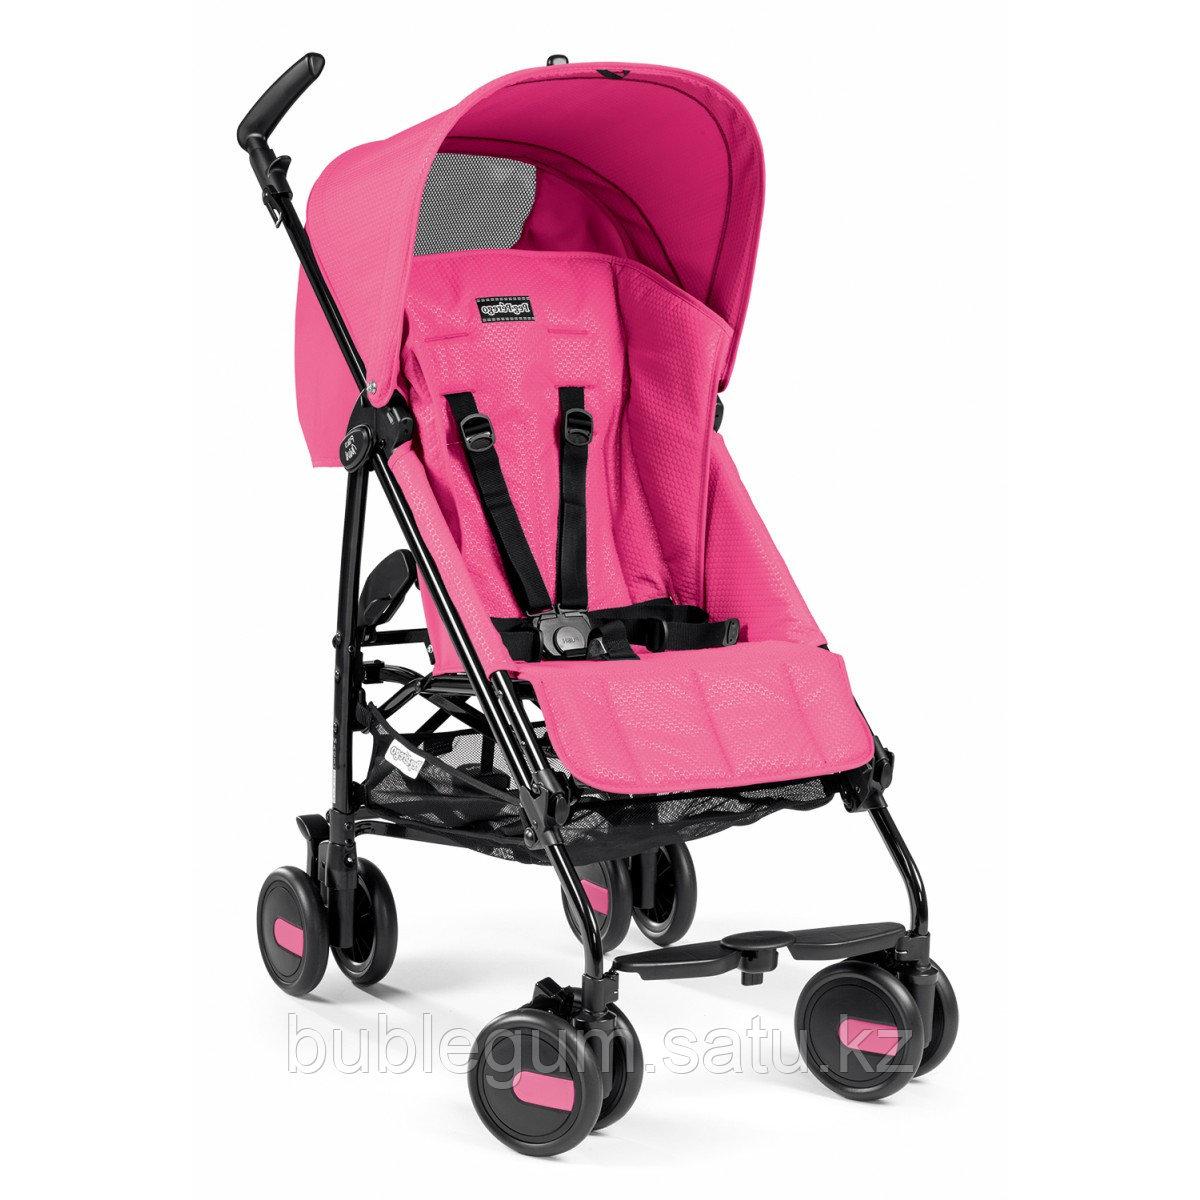 PEG PEREGO Коляска PLIKO MINI Lightweight stroller with hood MOD PINK